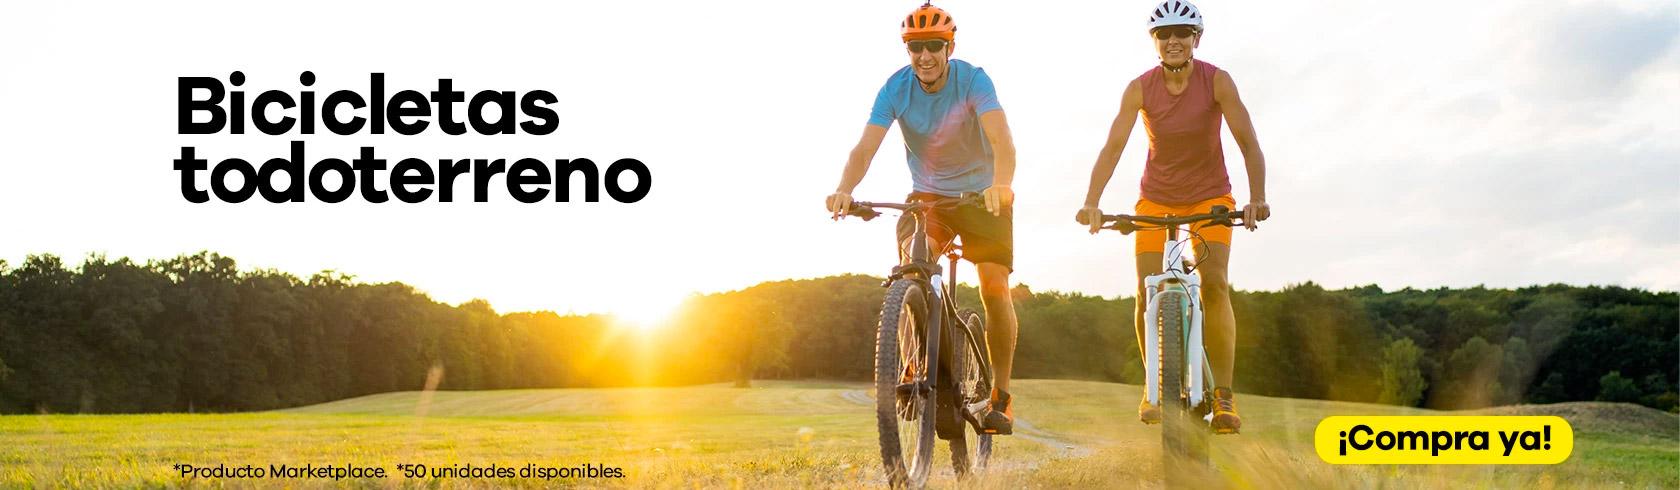 bicicletas_todoterreno